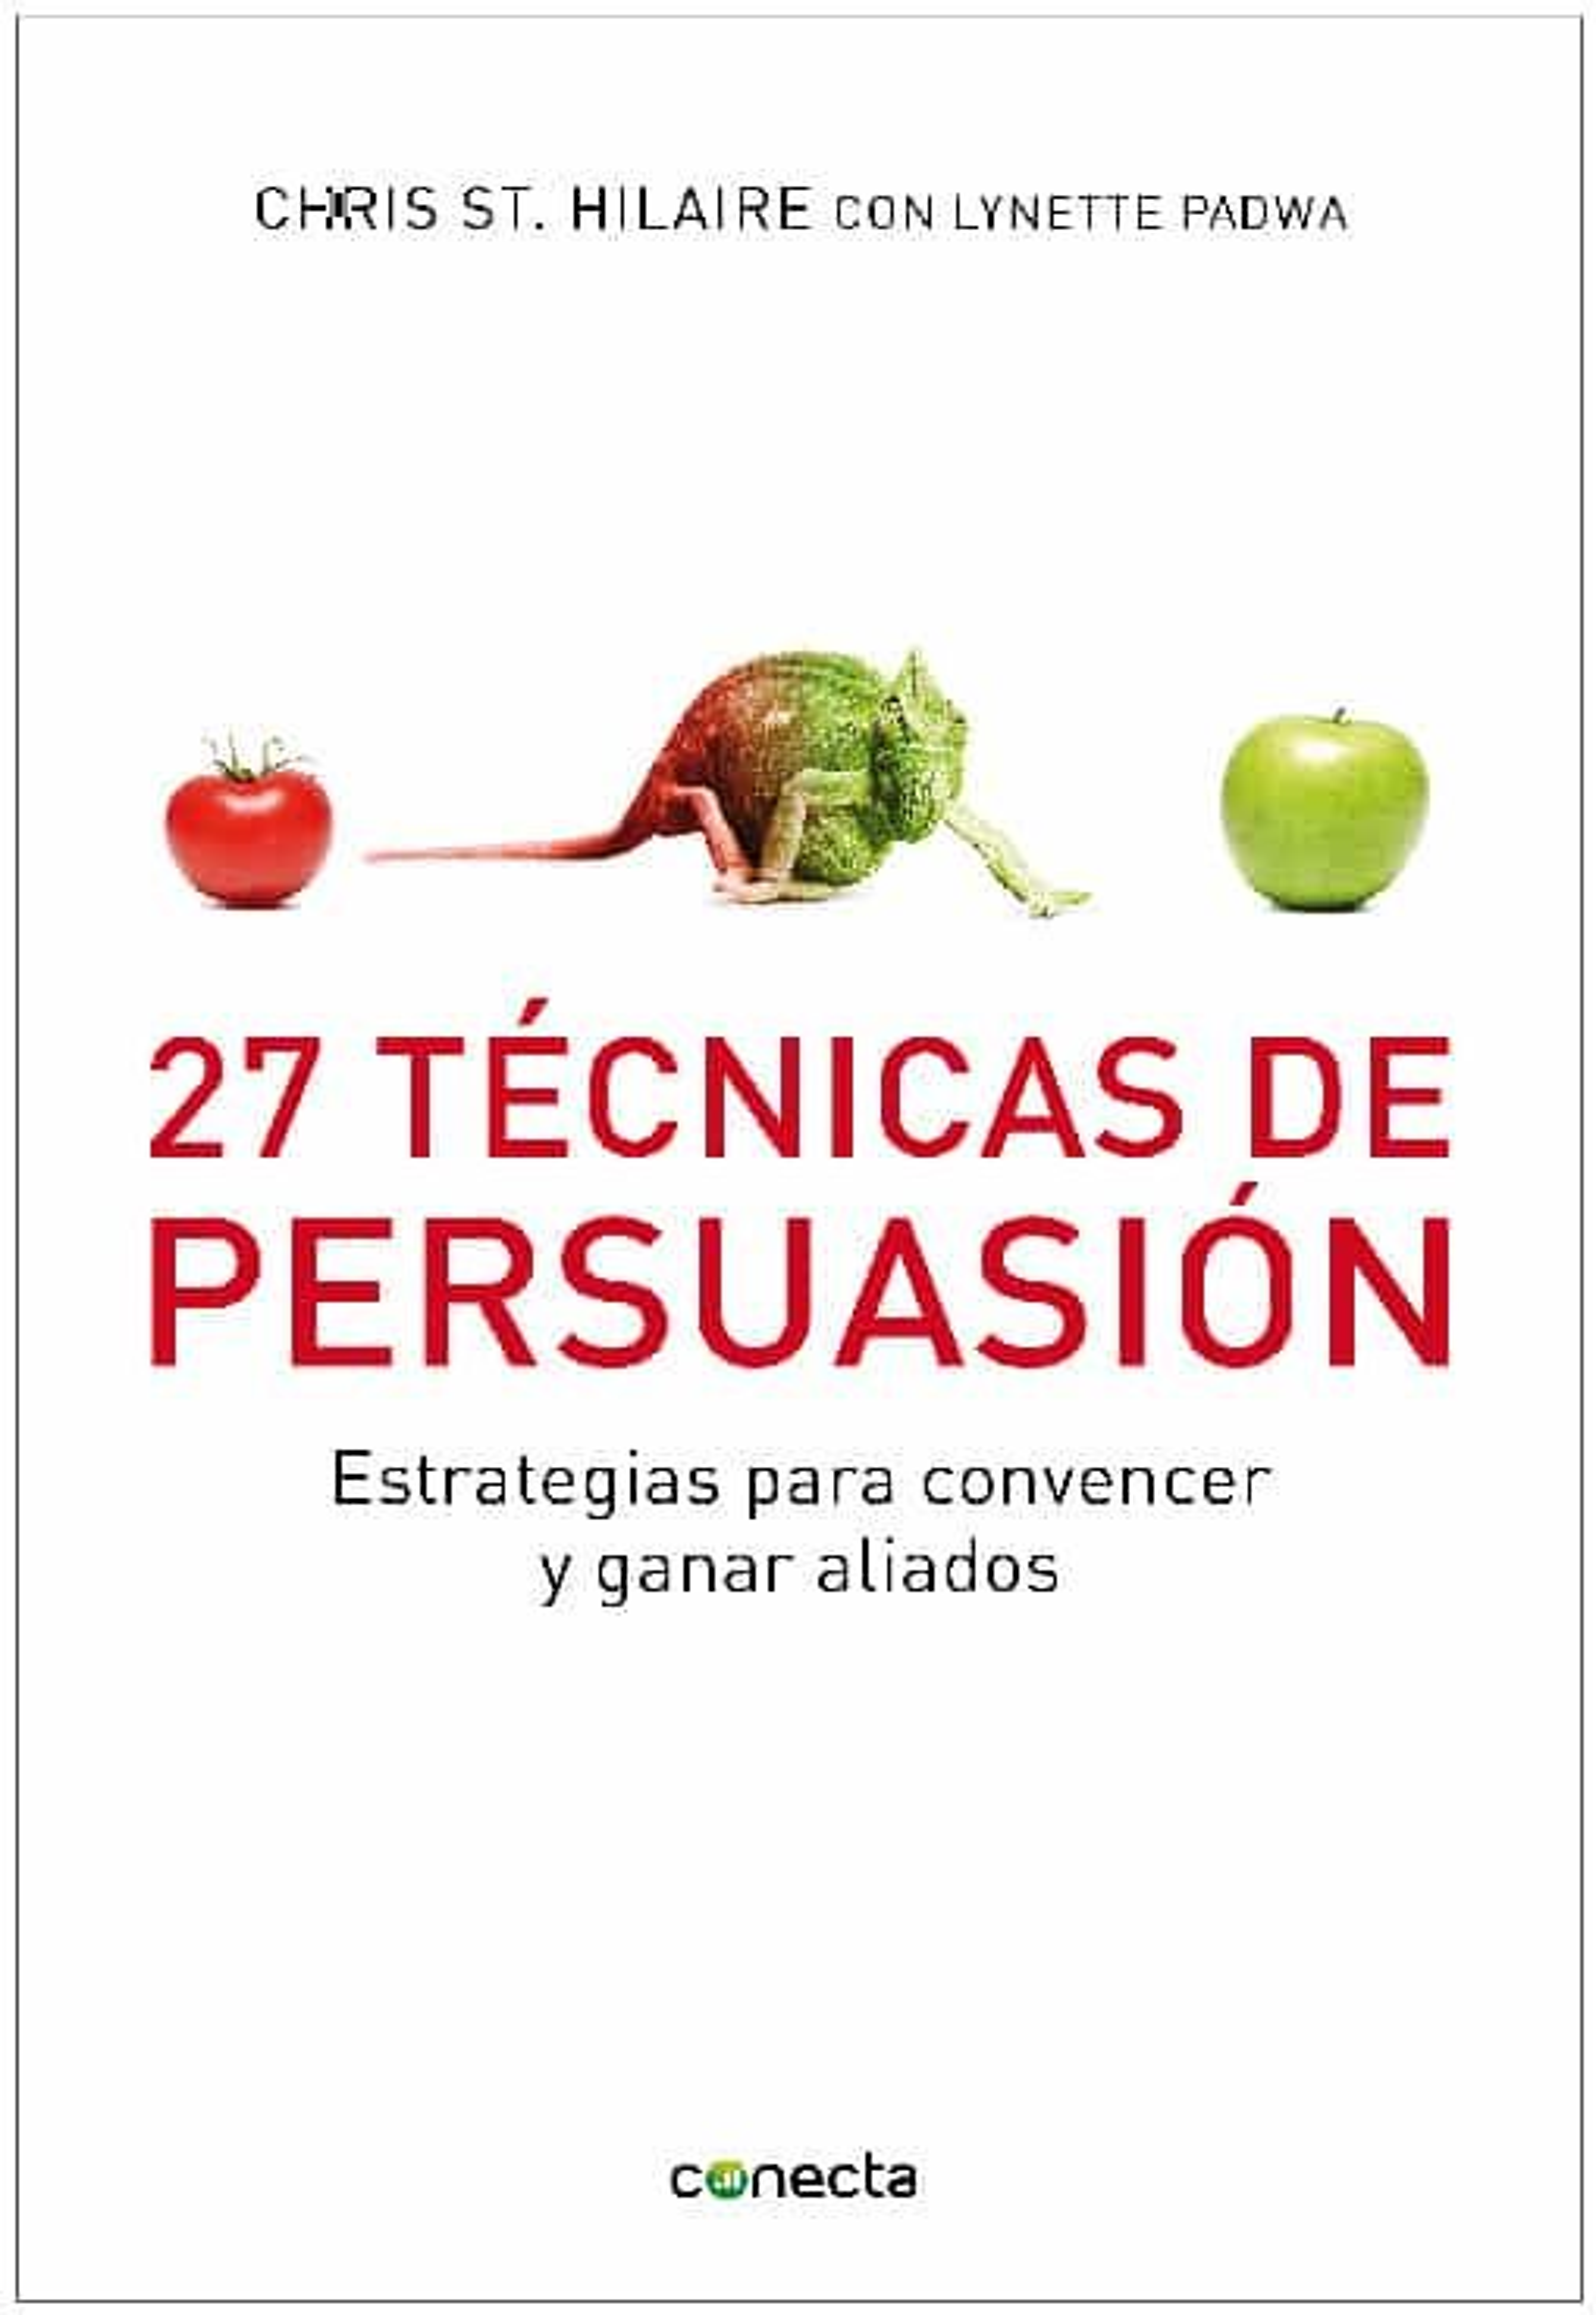 27 tecnicas de persuasion-chris st. hilare-9788493869366